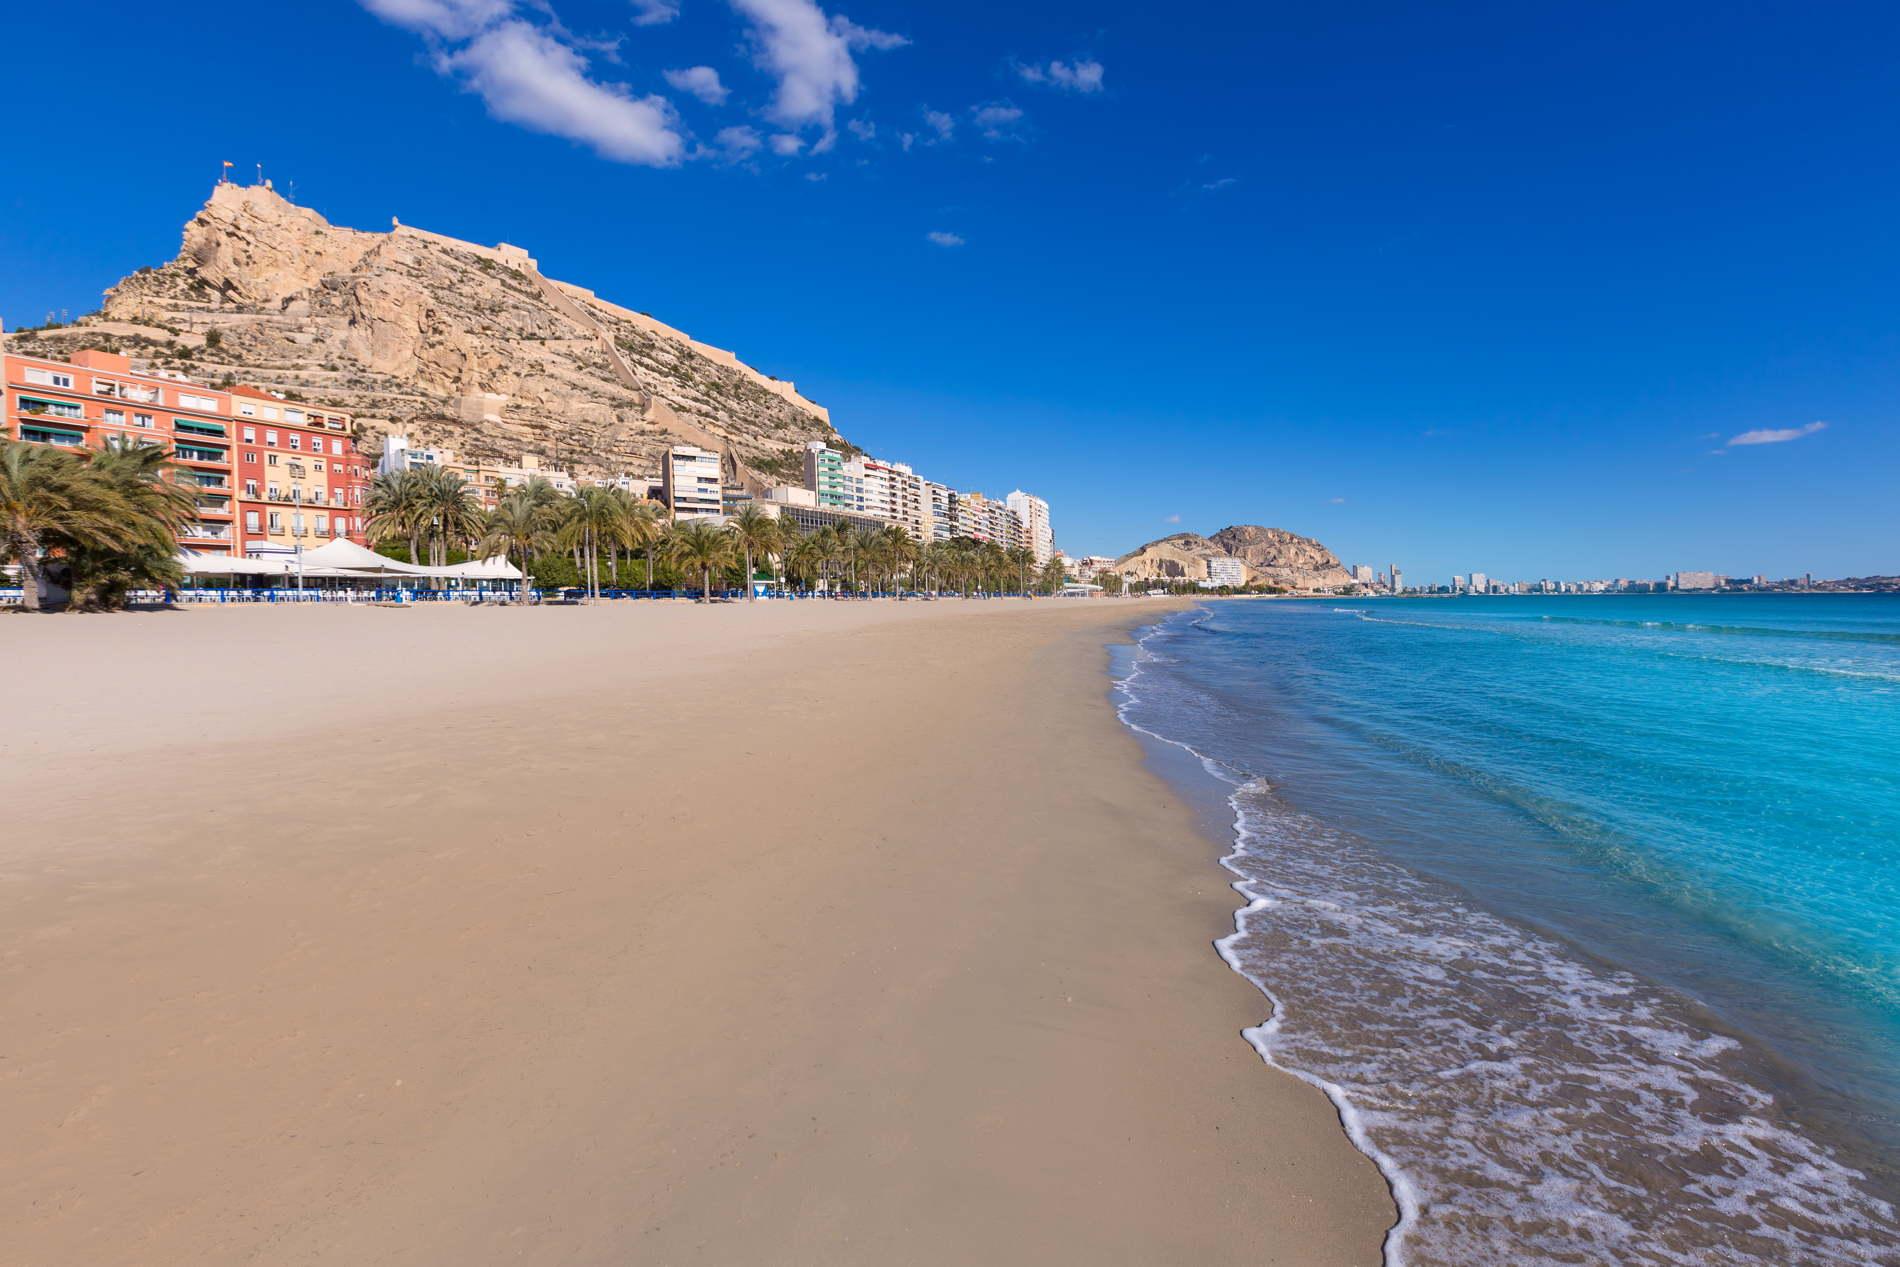 Vivre au bord de la plage Alicante